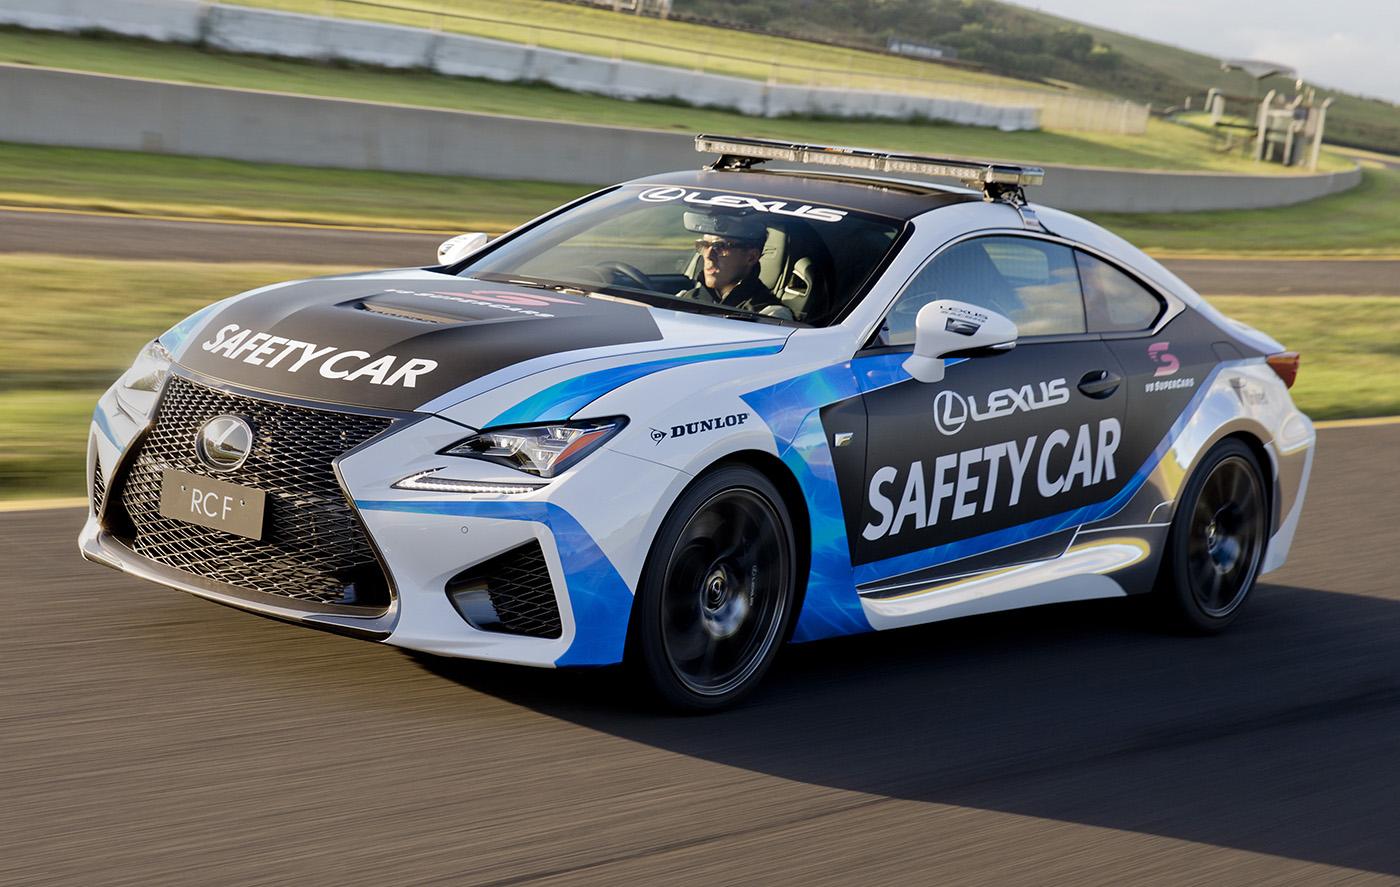 lexus_rc_f_v8sc_safety_car_07